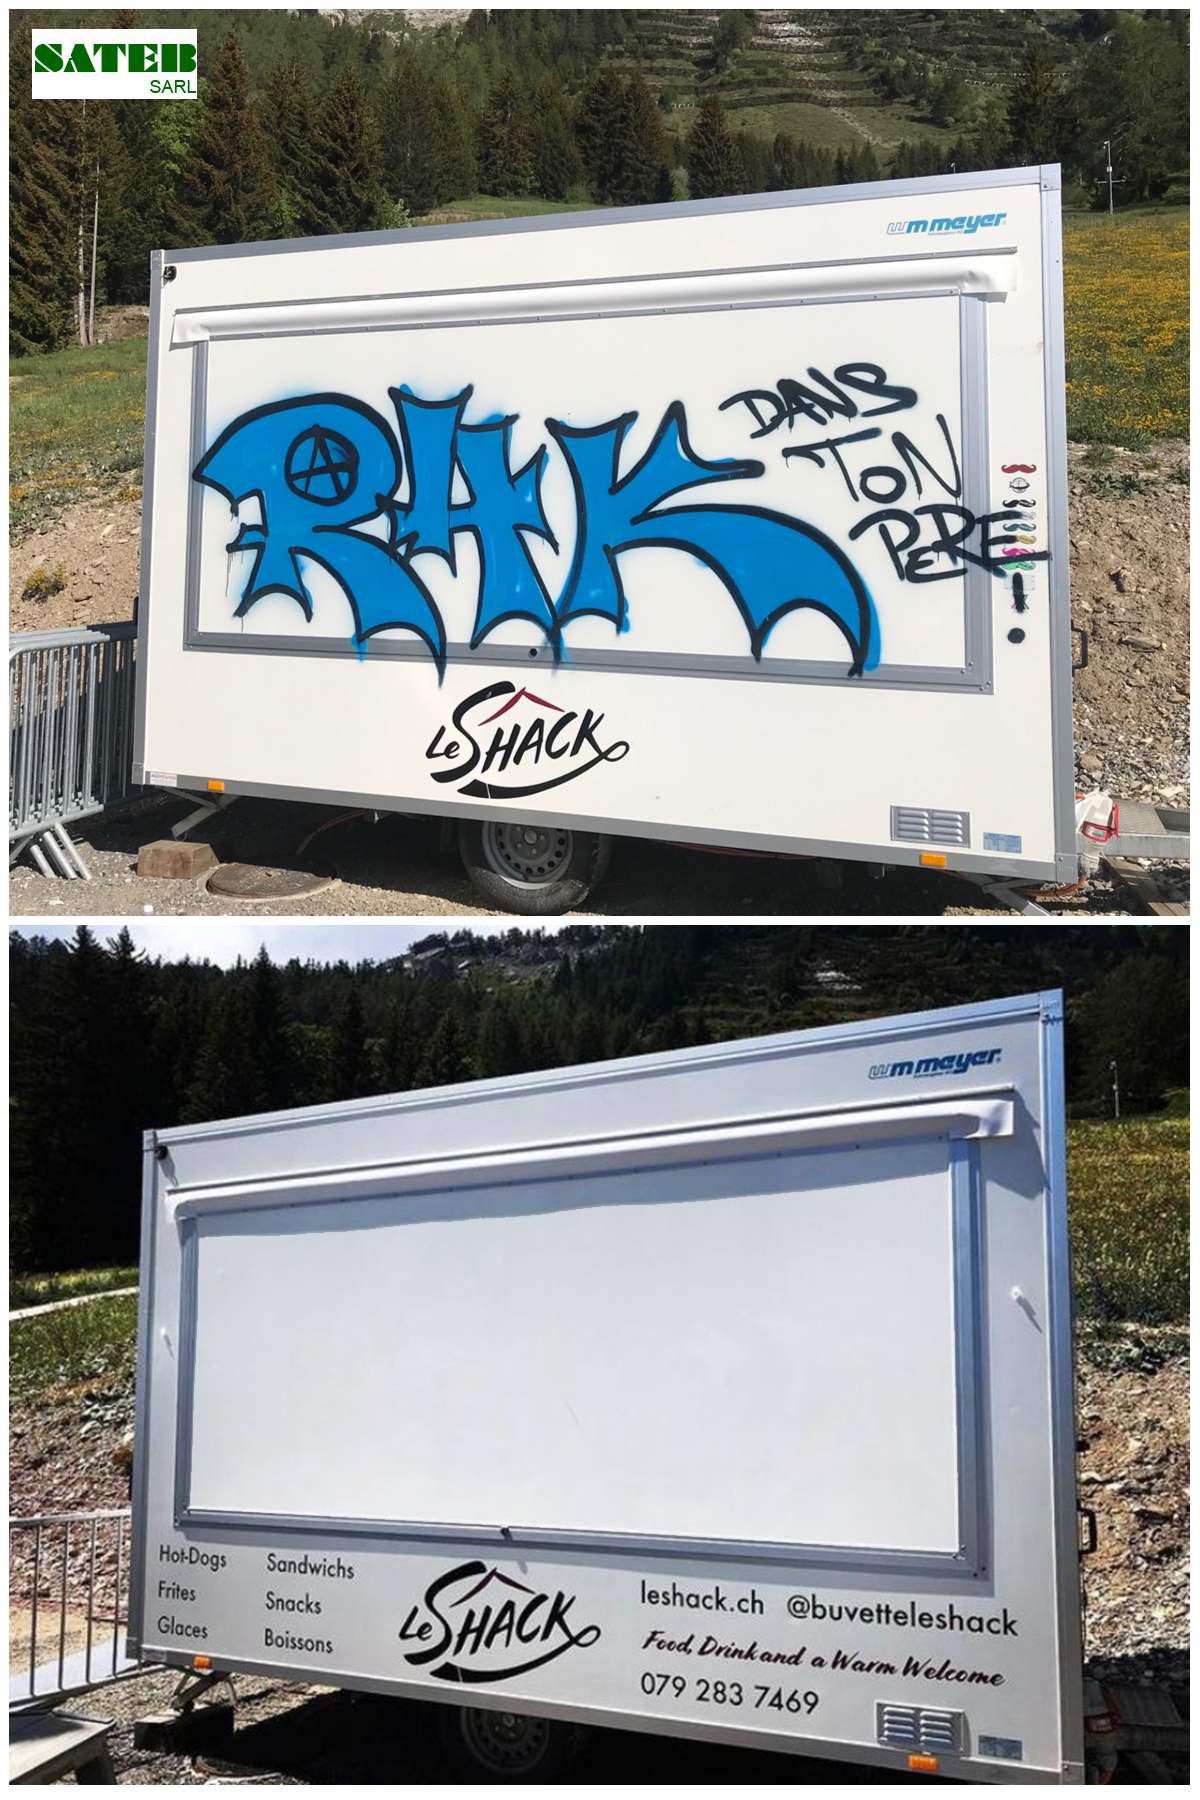 restauration anti-graffiti foodtruck